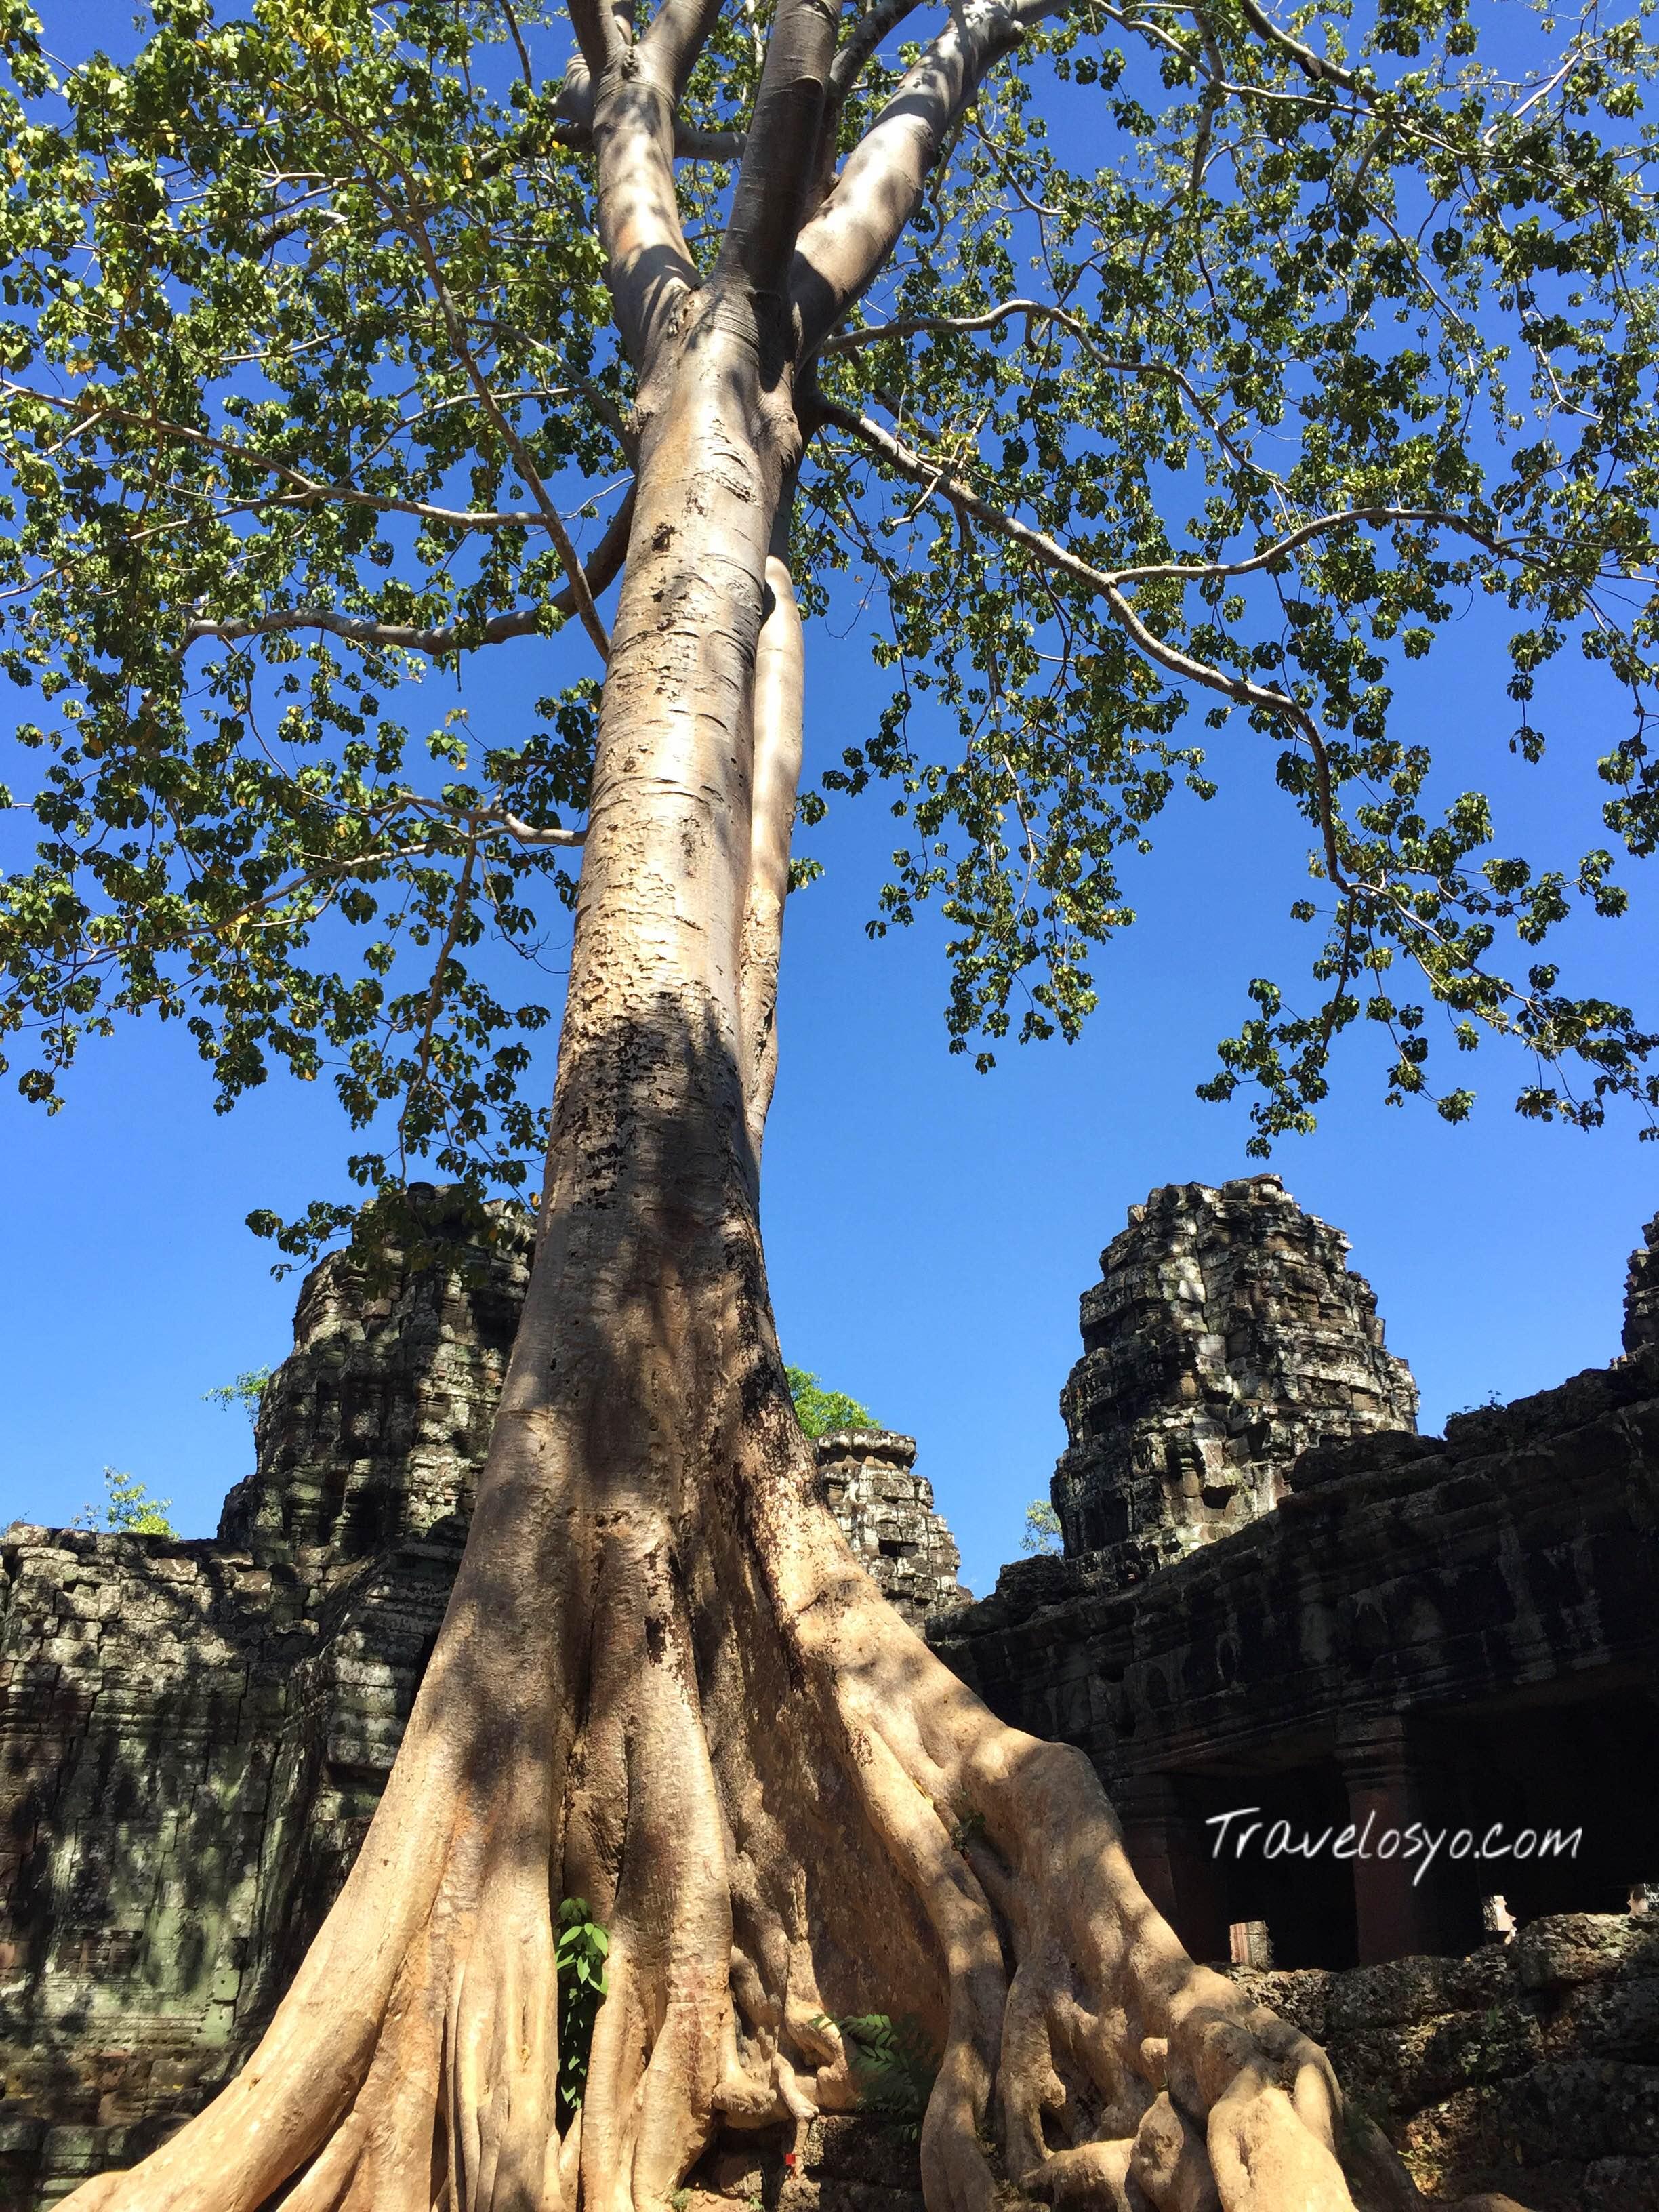 Bantay Srei inside